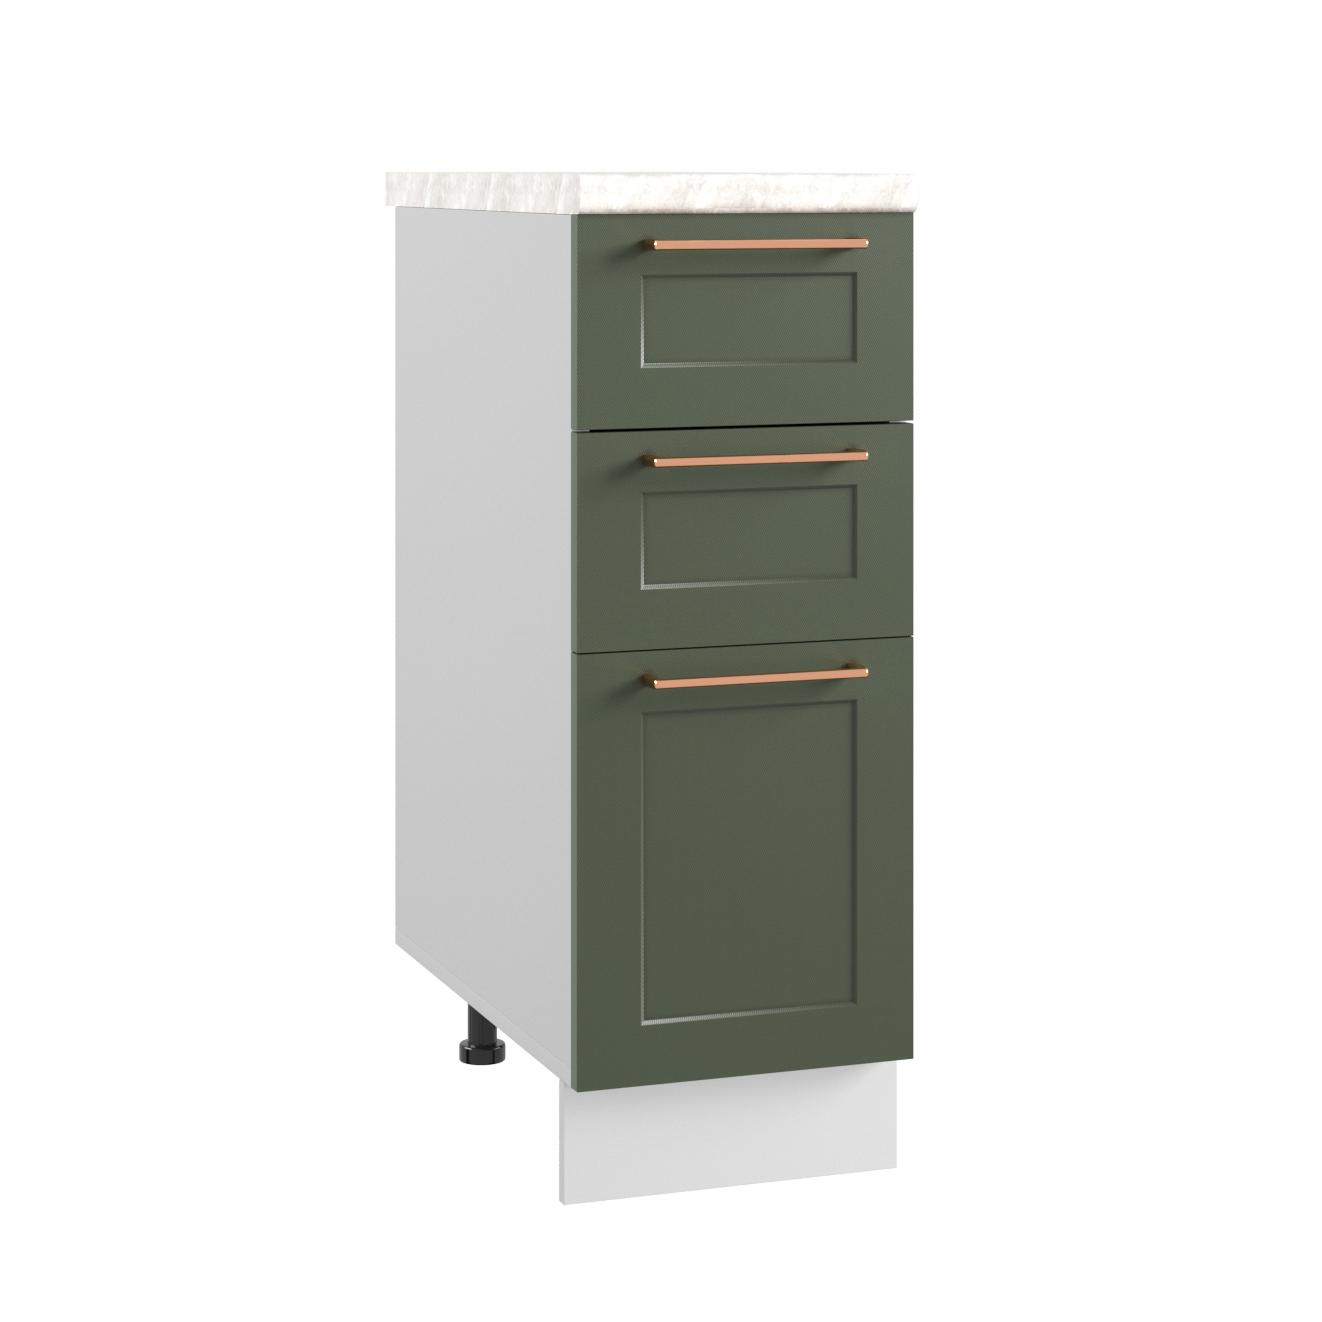 Кухня Квадро СЯ 300 Шкаф нижний с ящиками